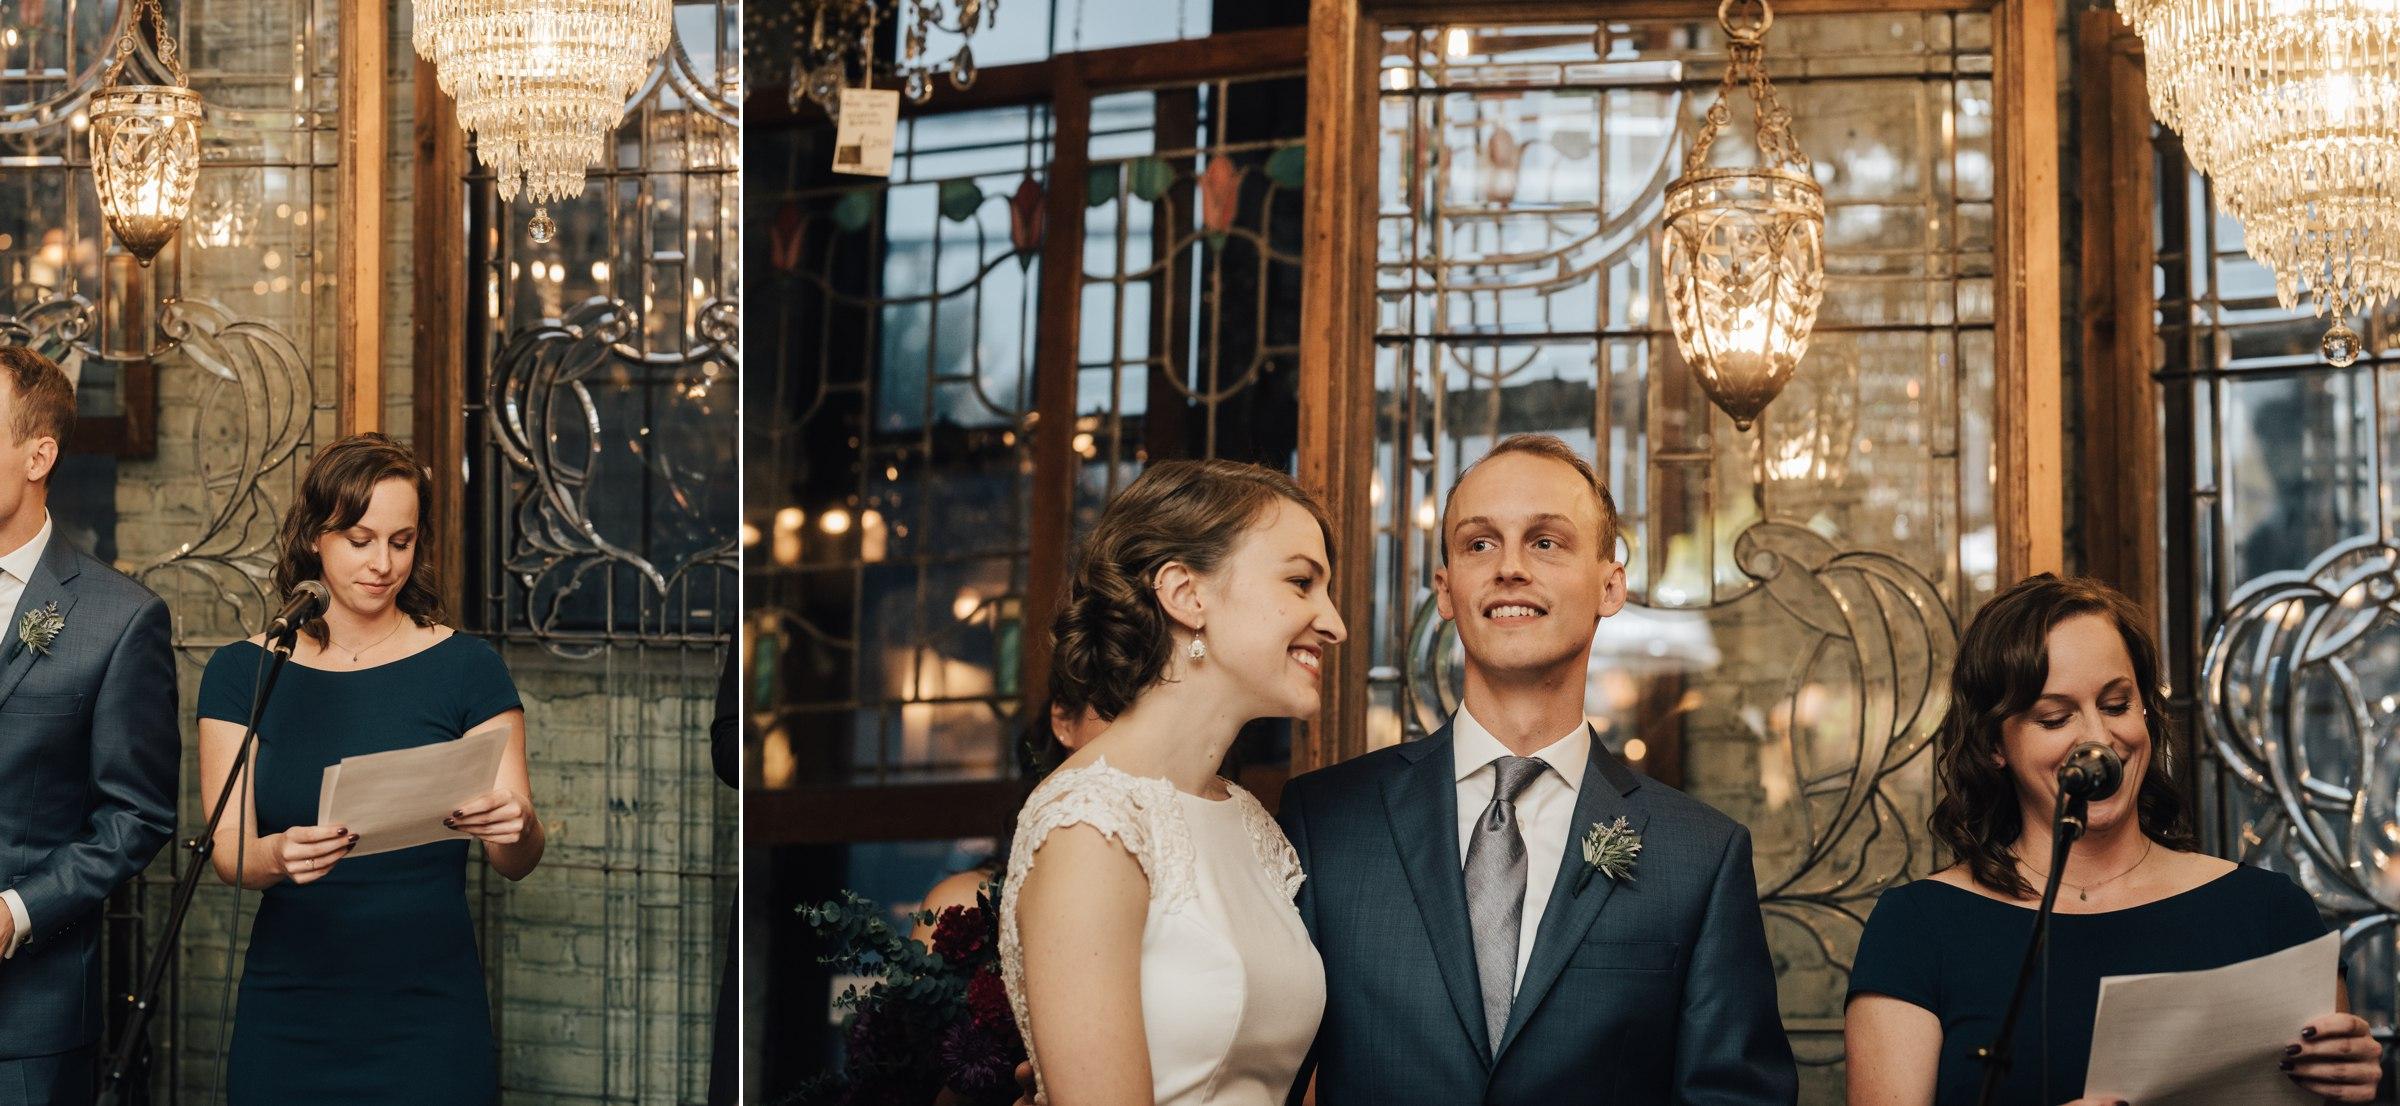 best-elopement-austin-minneapolis-northeast-adventurous-wedding-warehouse-modern-loft-moroccan_0081.jpg